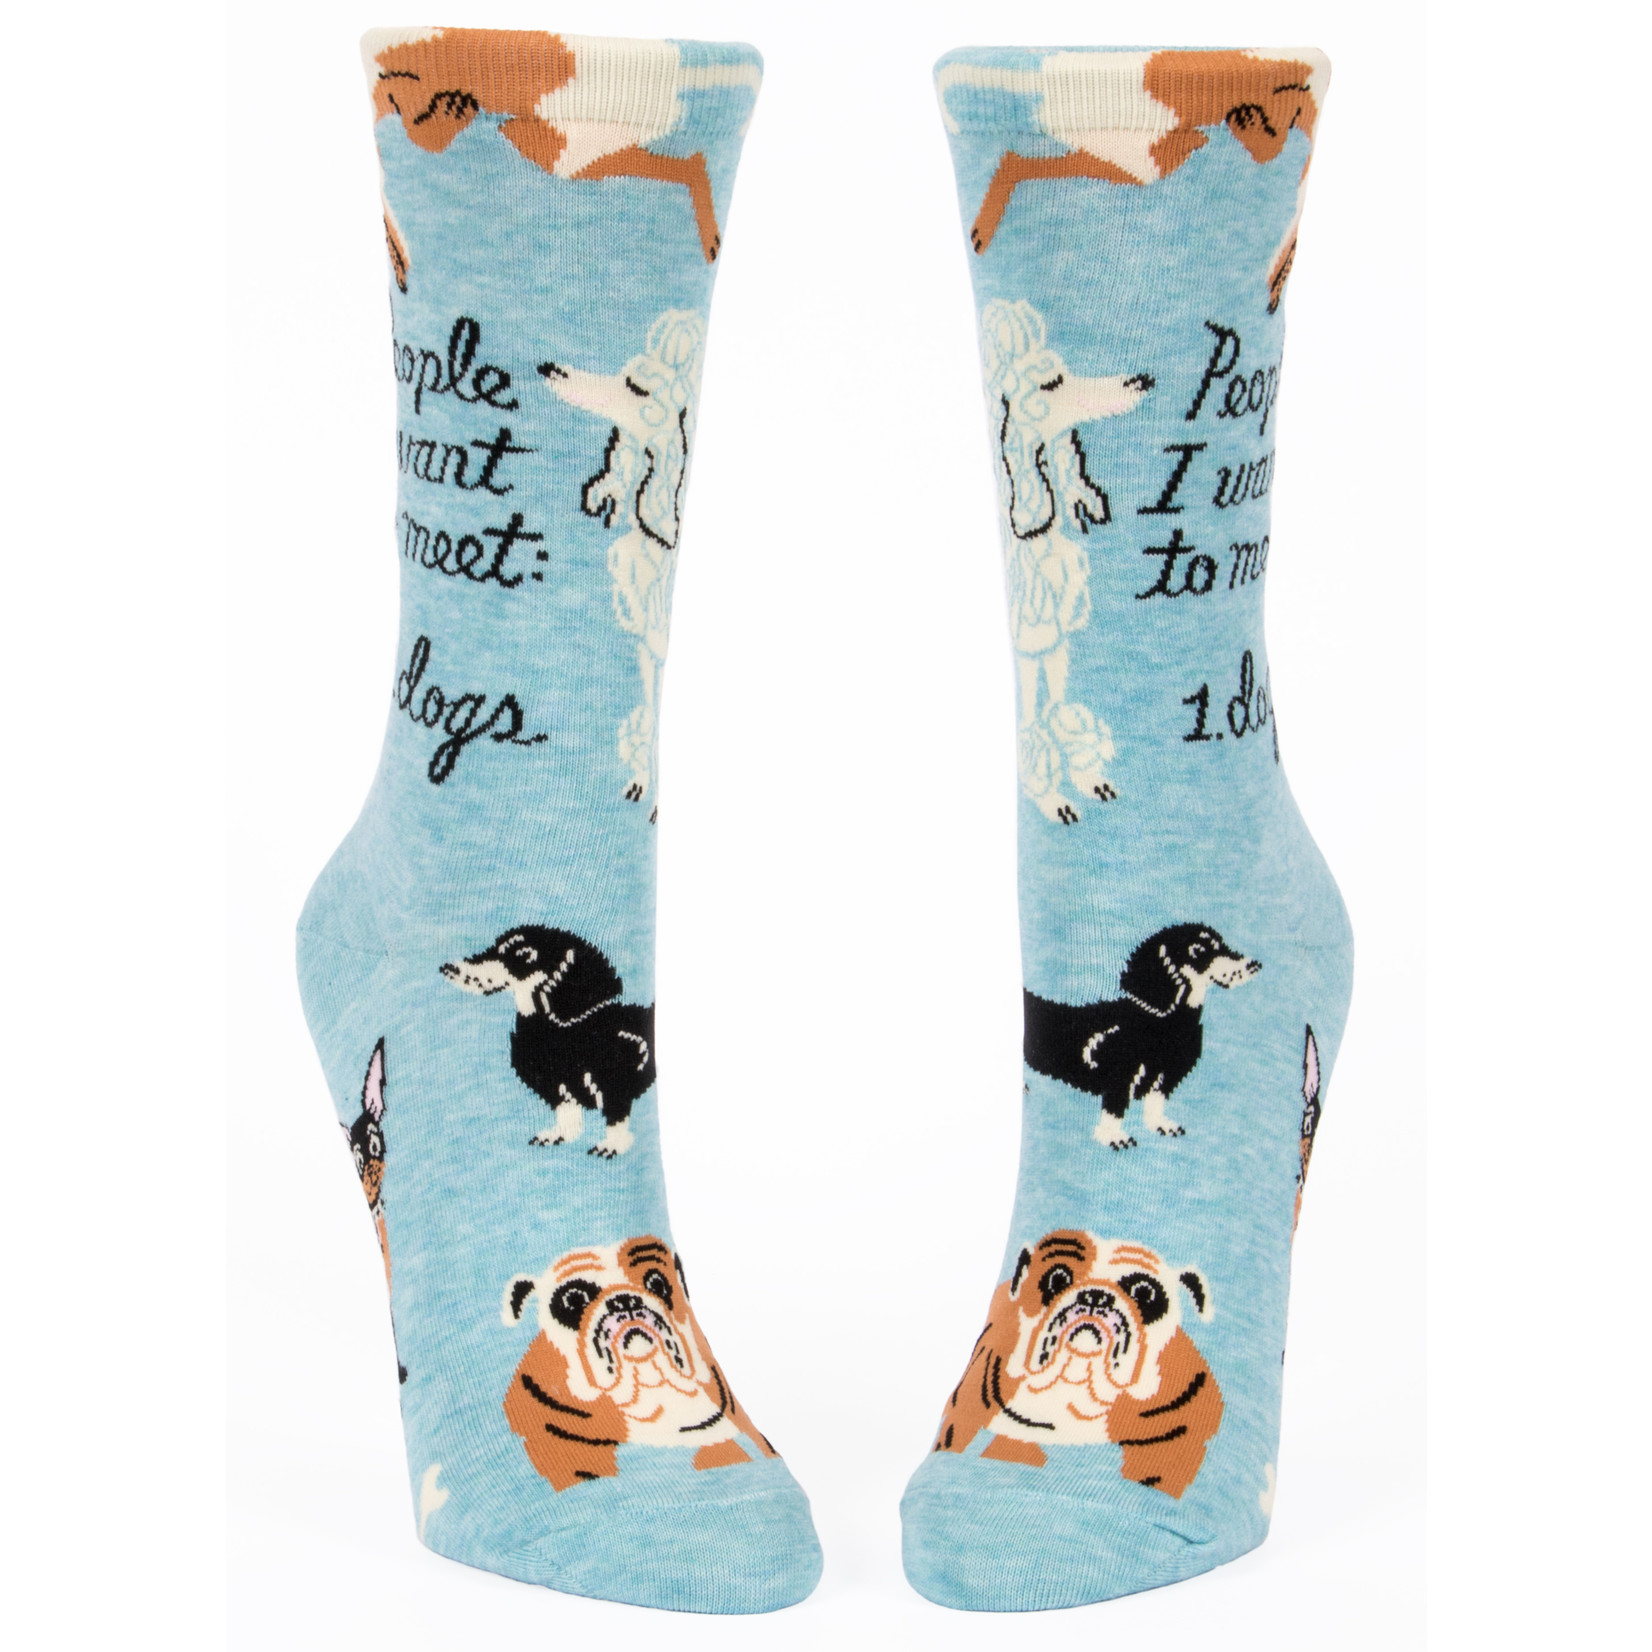 Blue Q People to Meet: Dogs W - Crew Socks